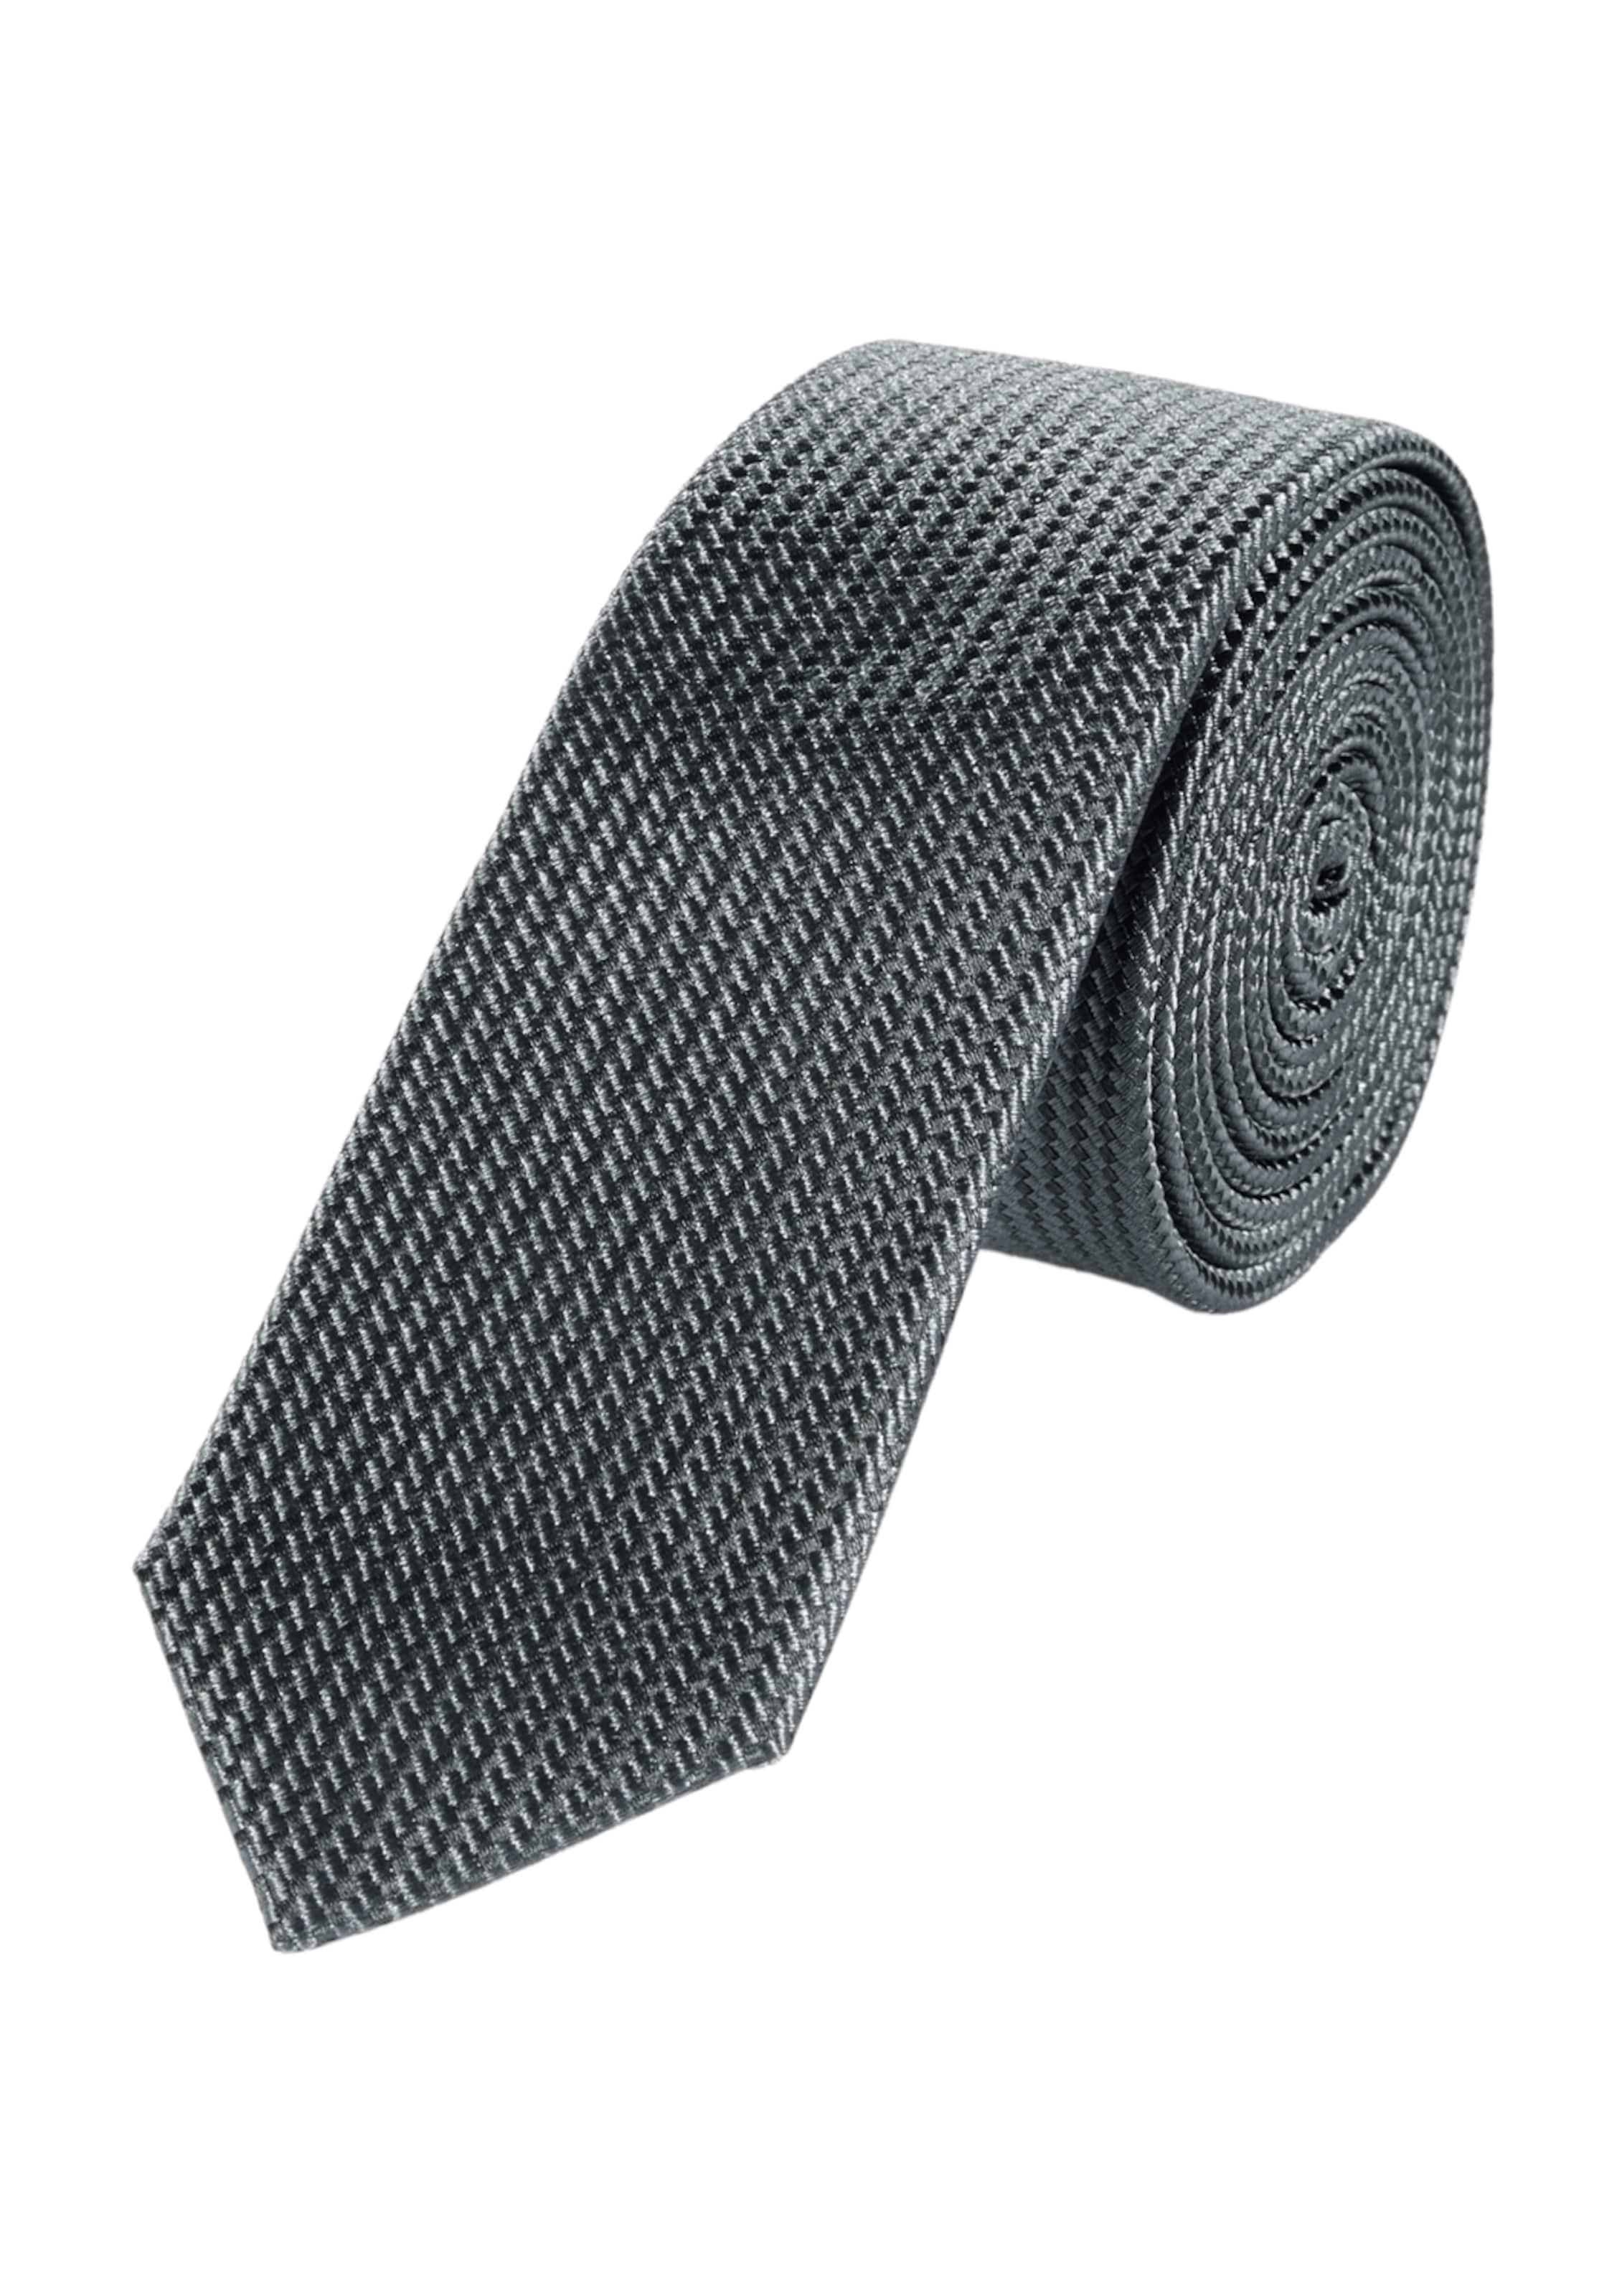 s.Oliver BLACK LABEL Krawatte mit Strukturmuster Mit Kreditkarte rFQPfEu